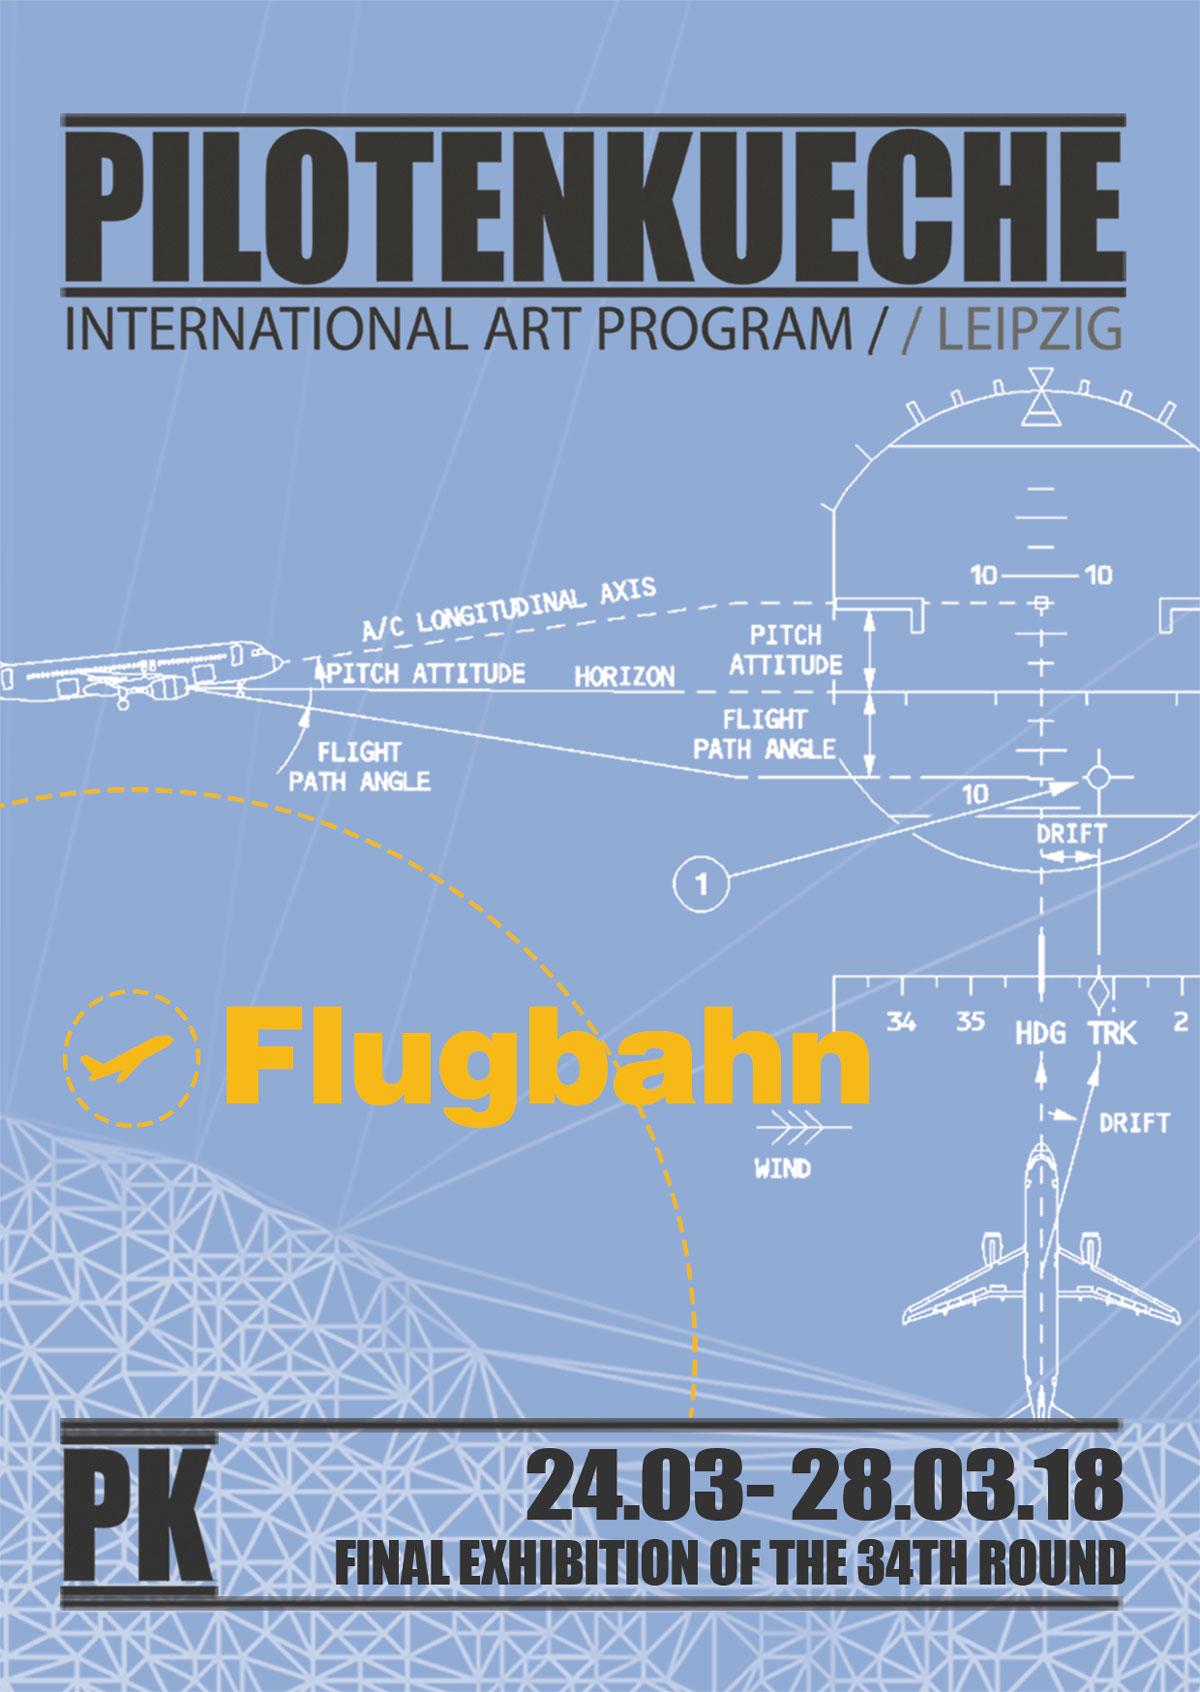 180216_Flugbahn-Flyer_front_web